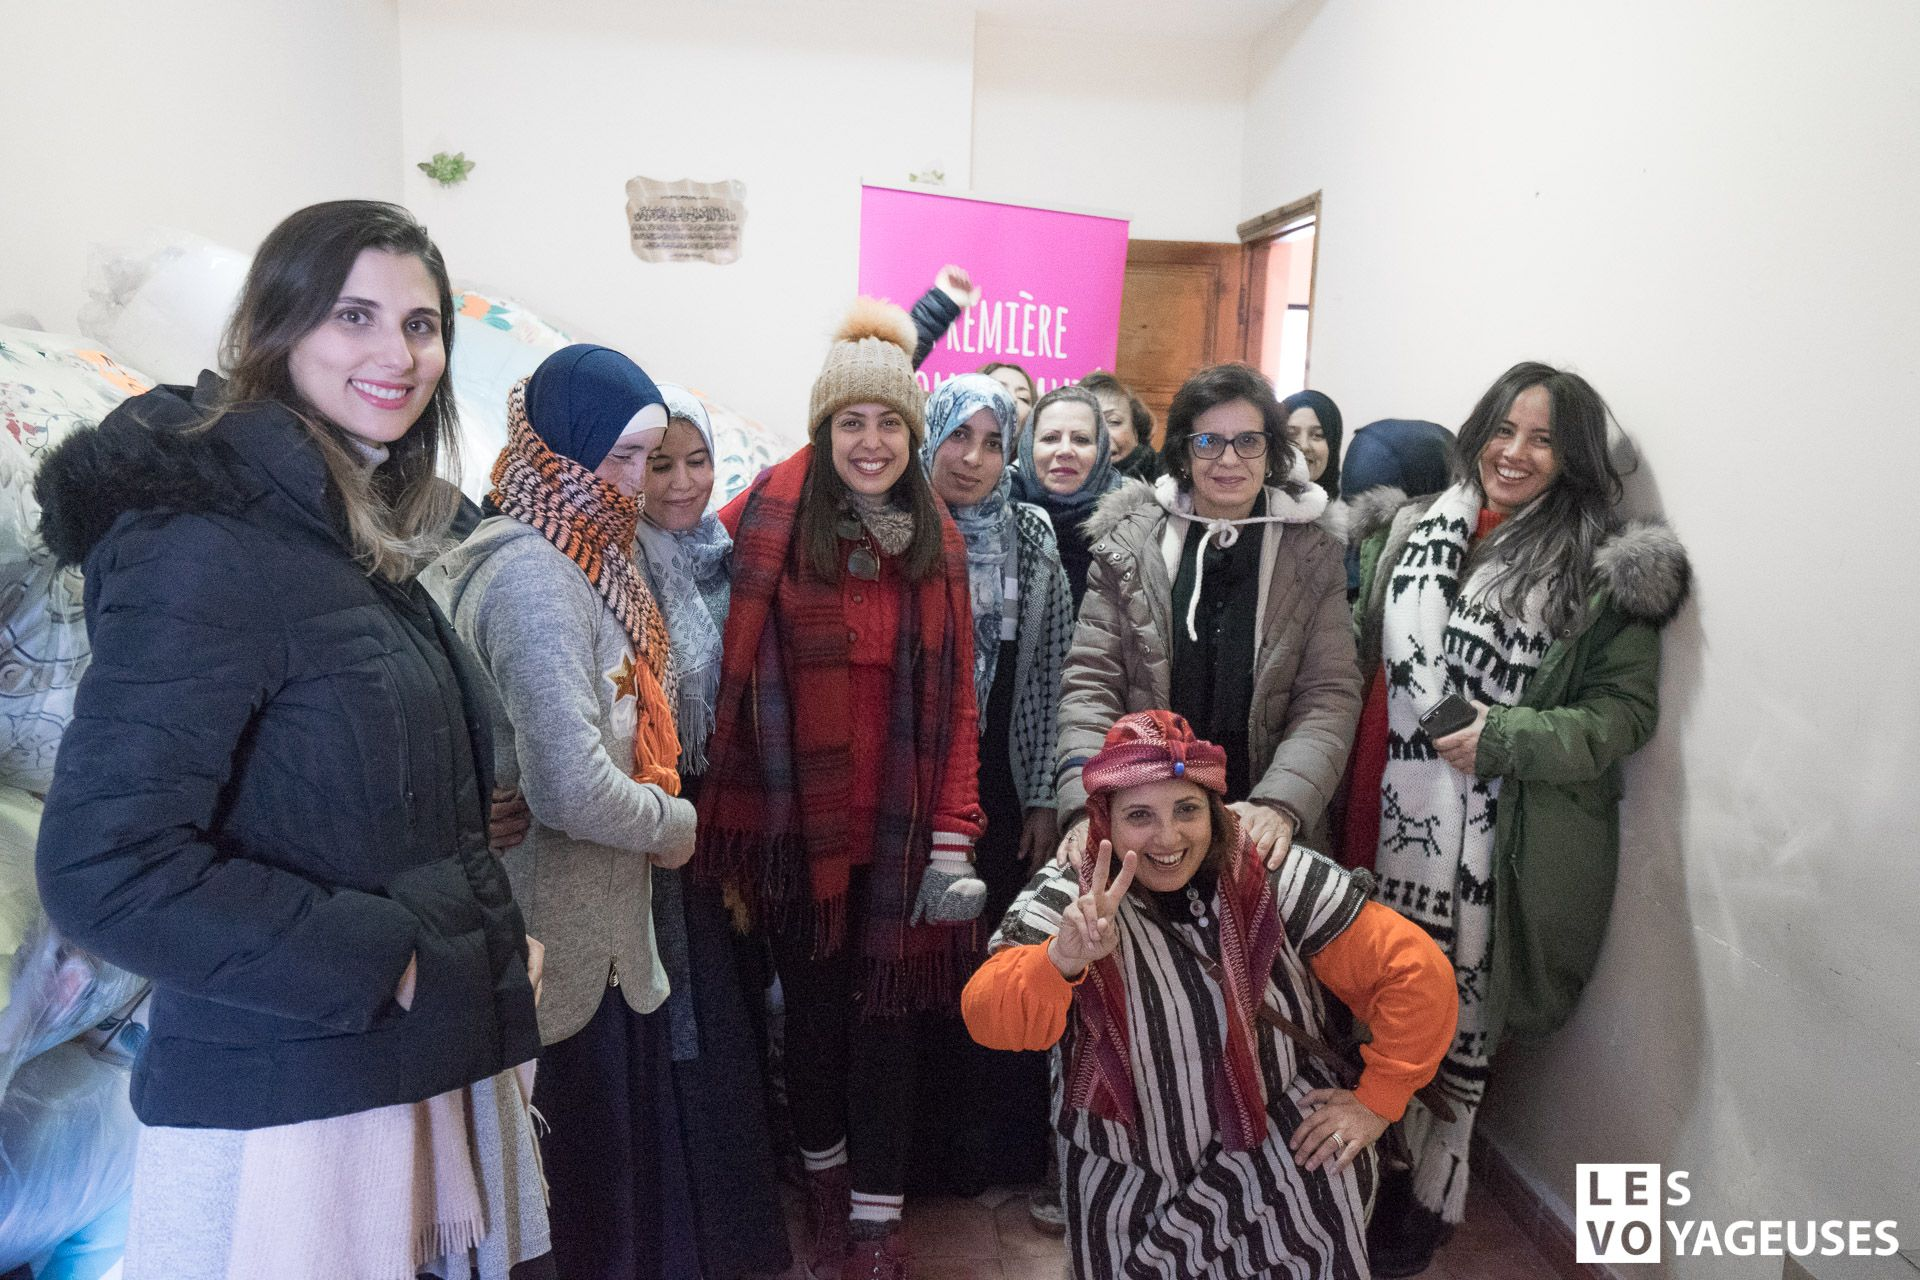 Les-voyageuses-maroc-imlil-hiver-09890